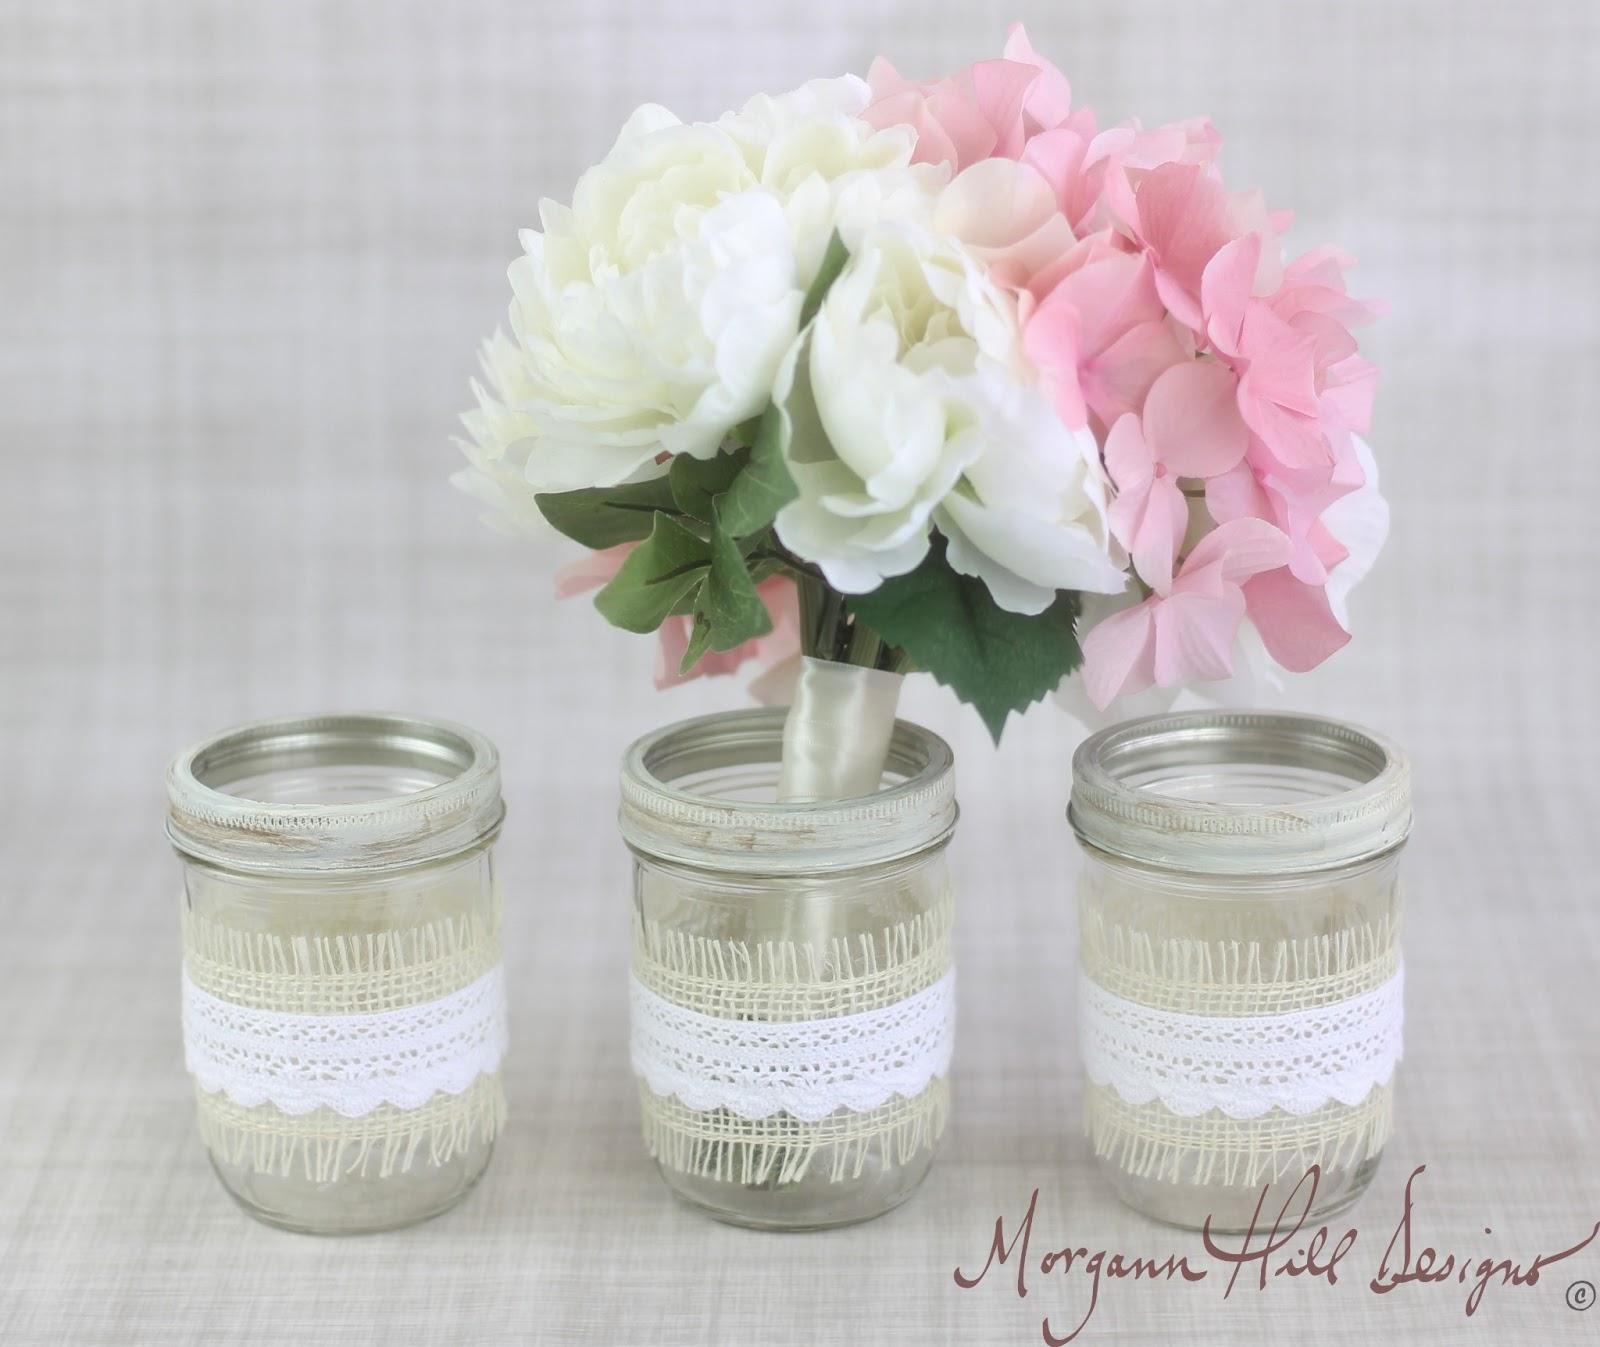 Country Wedding Centerpieces Mason Jars: Morgann Hill Designs: Mason Jar Wedding Centerpieces Vases